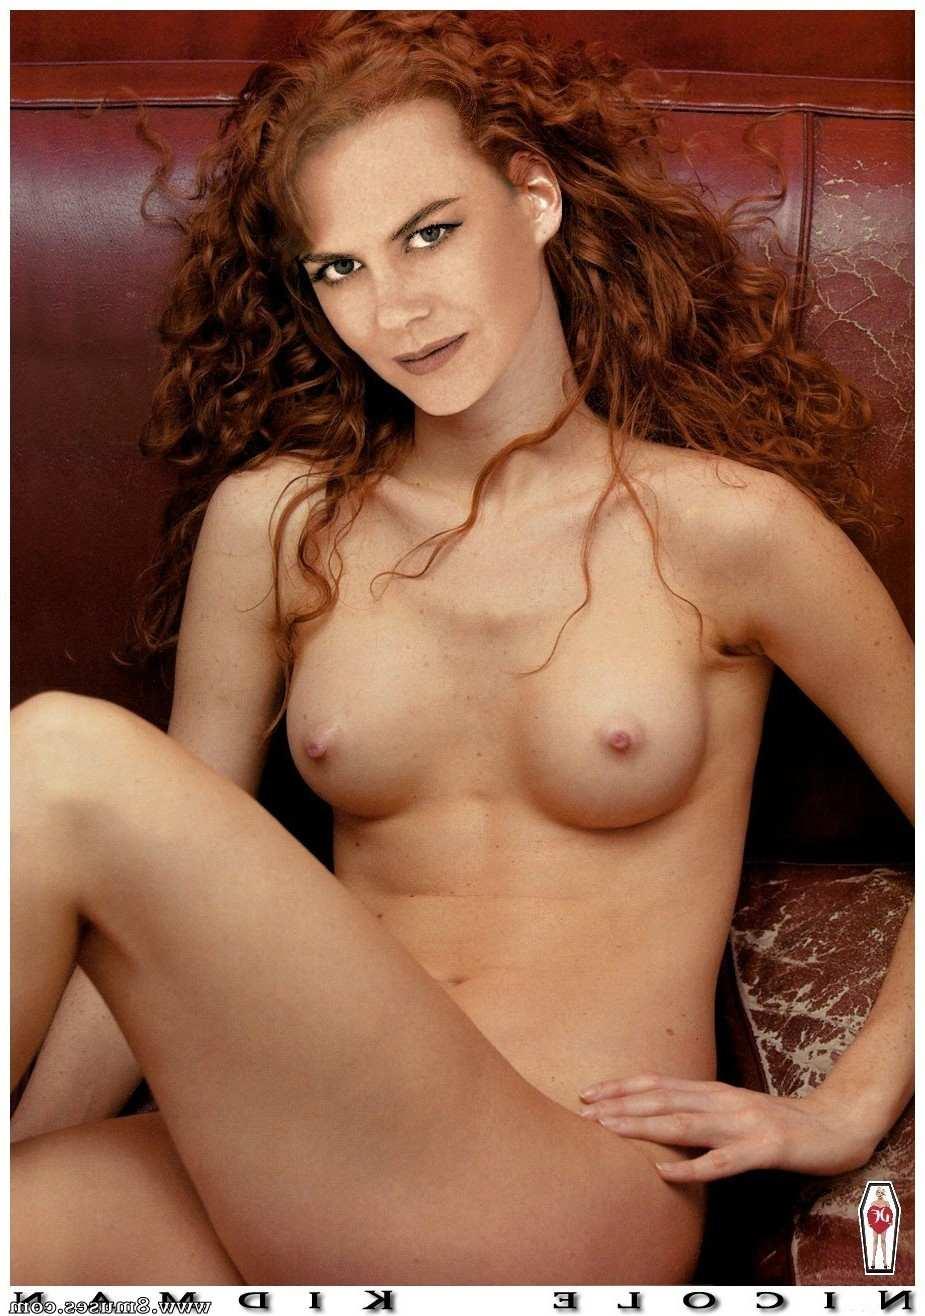 Fake-Celebrities-Sex-Pictures/Nicole-Kidman Nicole_Kidman__8muses_-_Sex_and_Porn_Comics_663.jpg